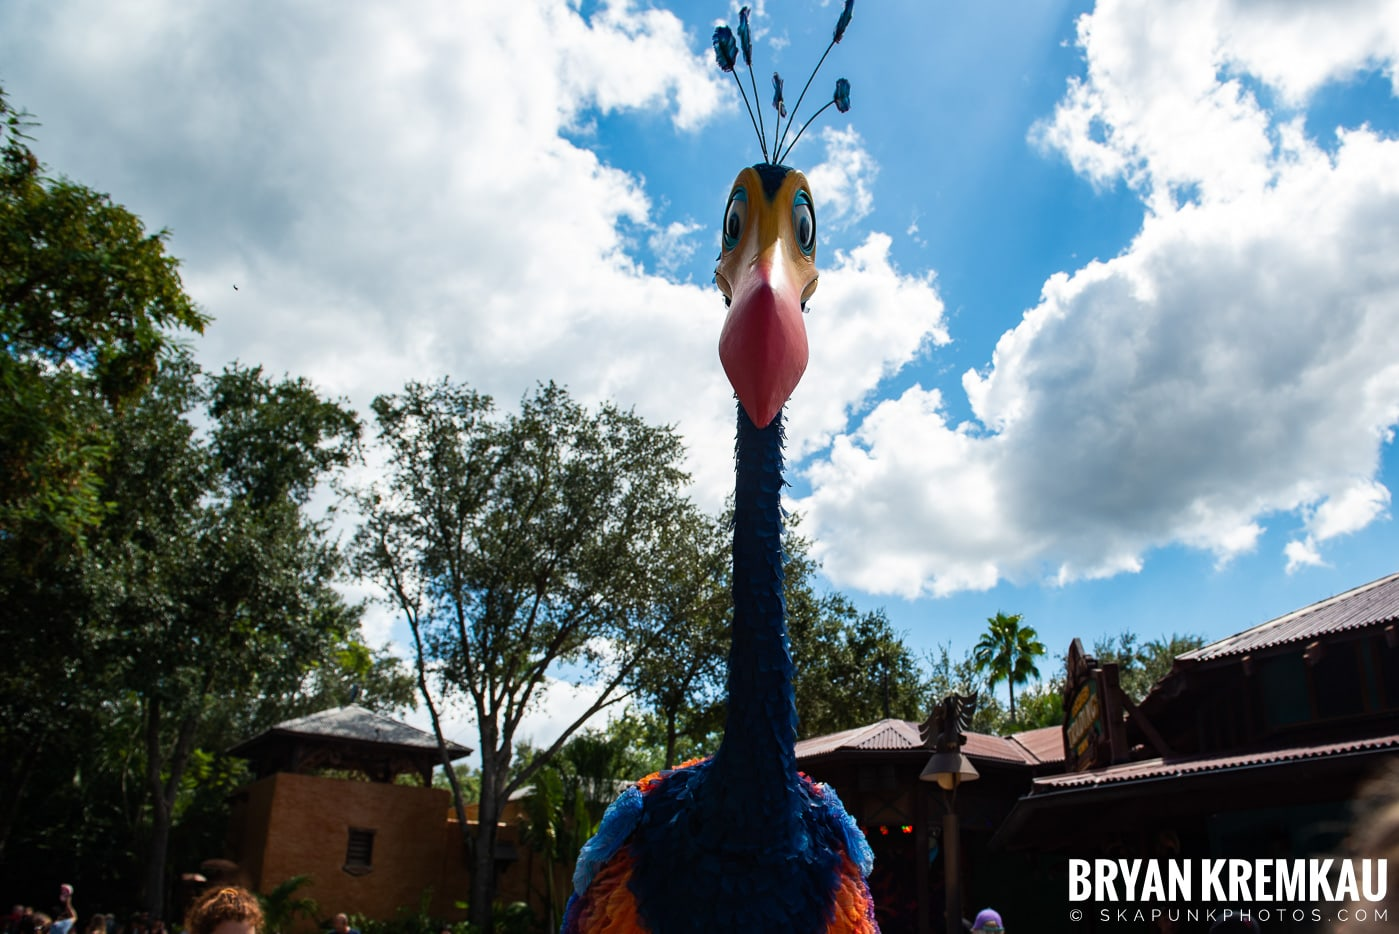 Walt Disney World Vacation: Day 5 (Animal Kingdom / Disney's Hollywood Studios) - 10.3.19 (52)